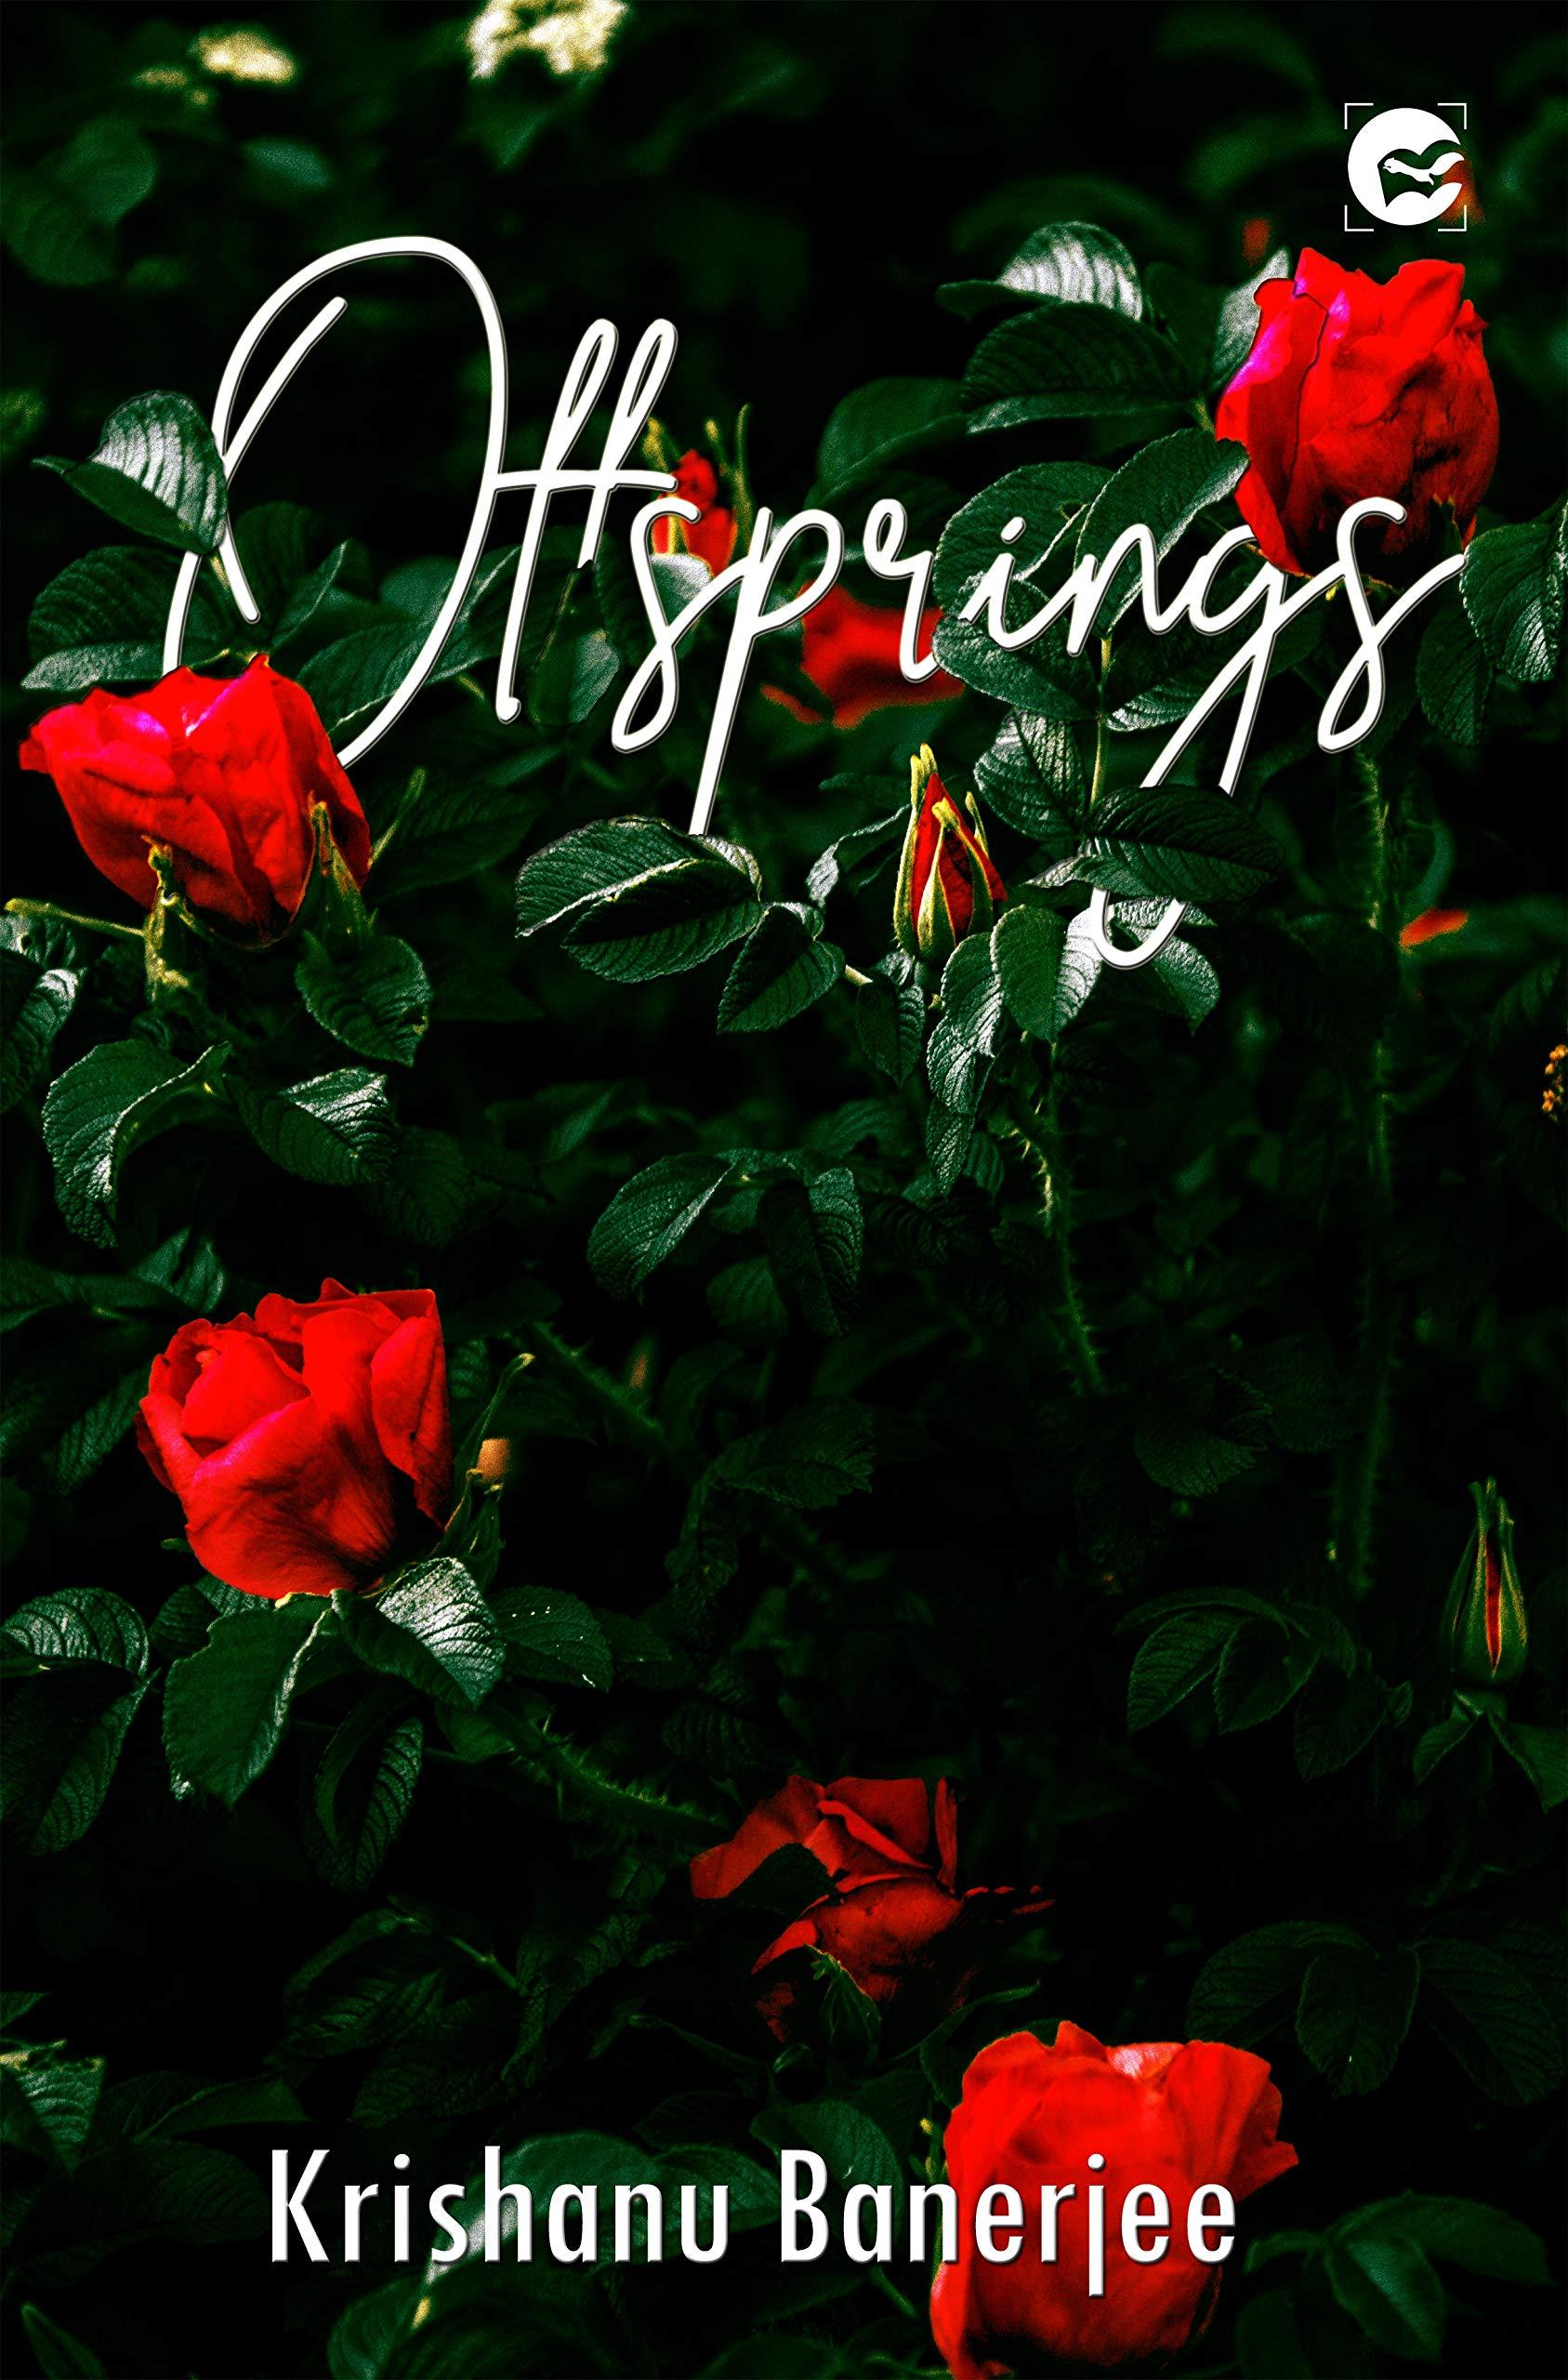 Book Review - Offsprings by Krishanu Banerjee